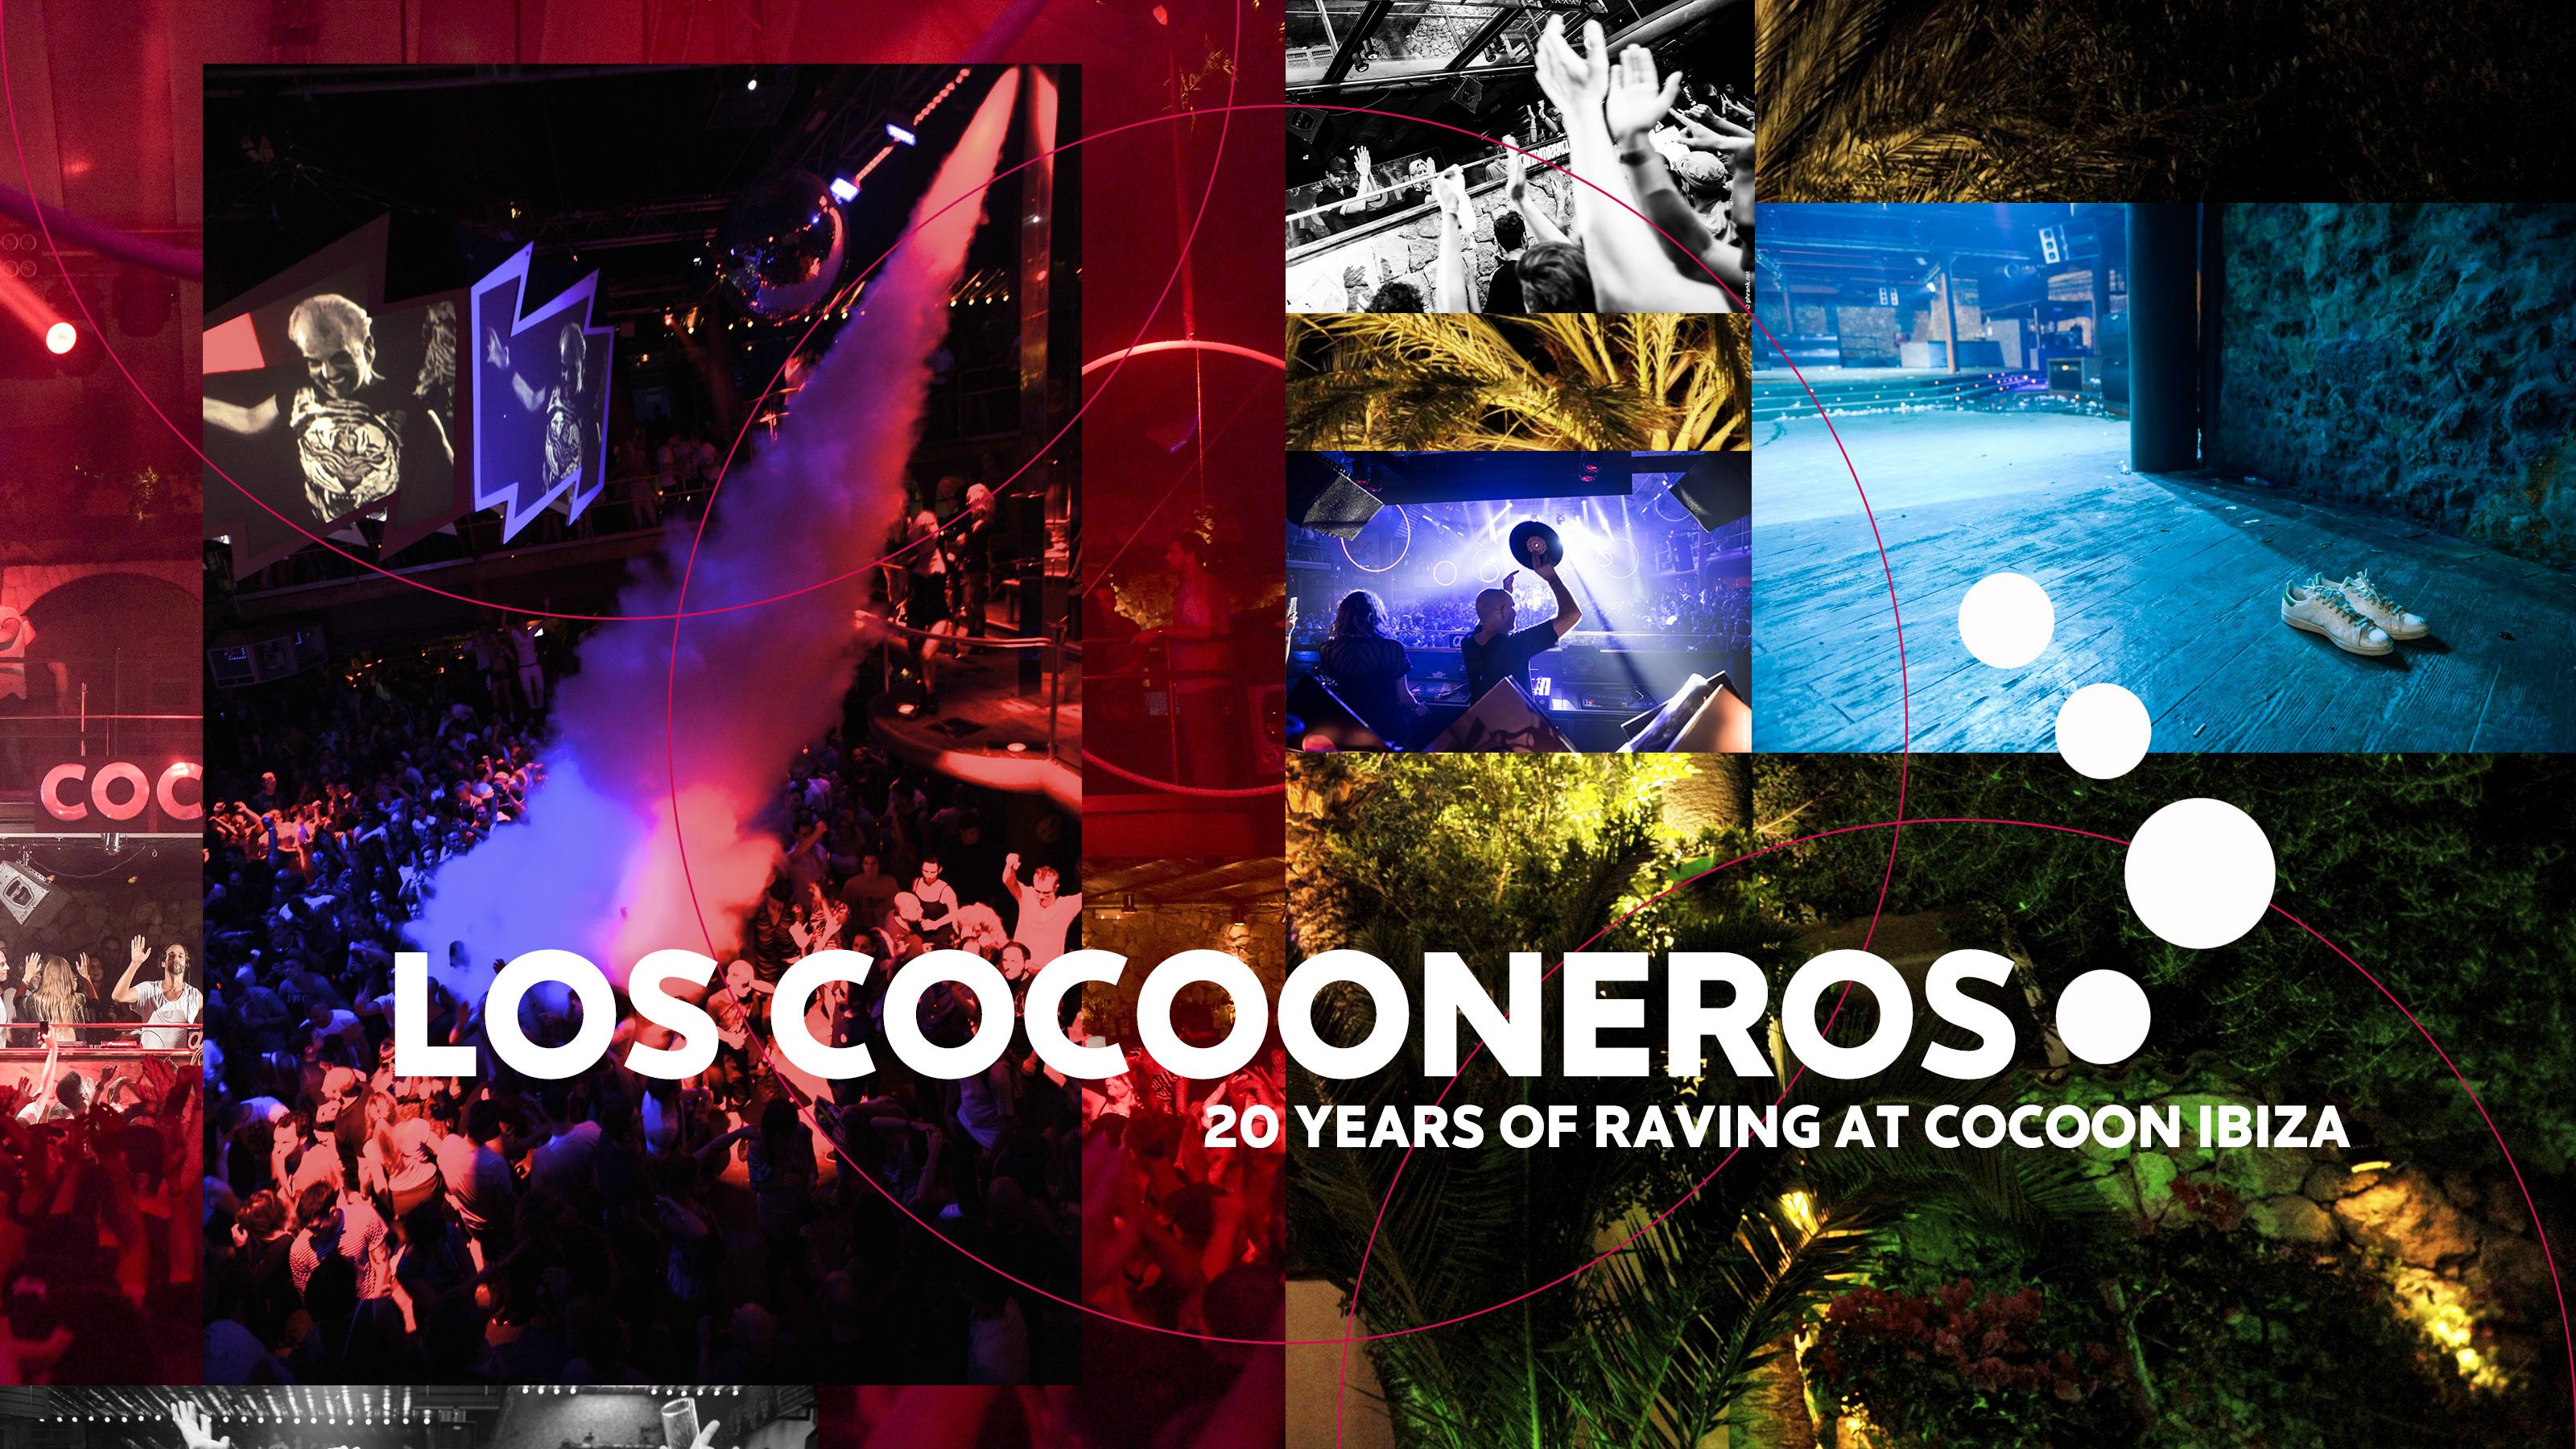 Los Cocooneros: 20 Years Of Raving At Cocoon Ibiza